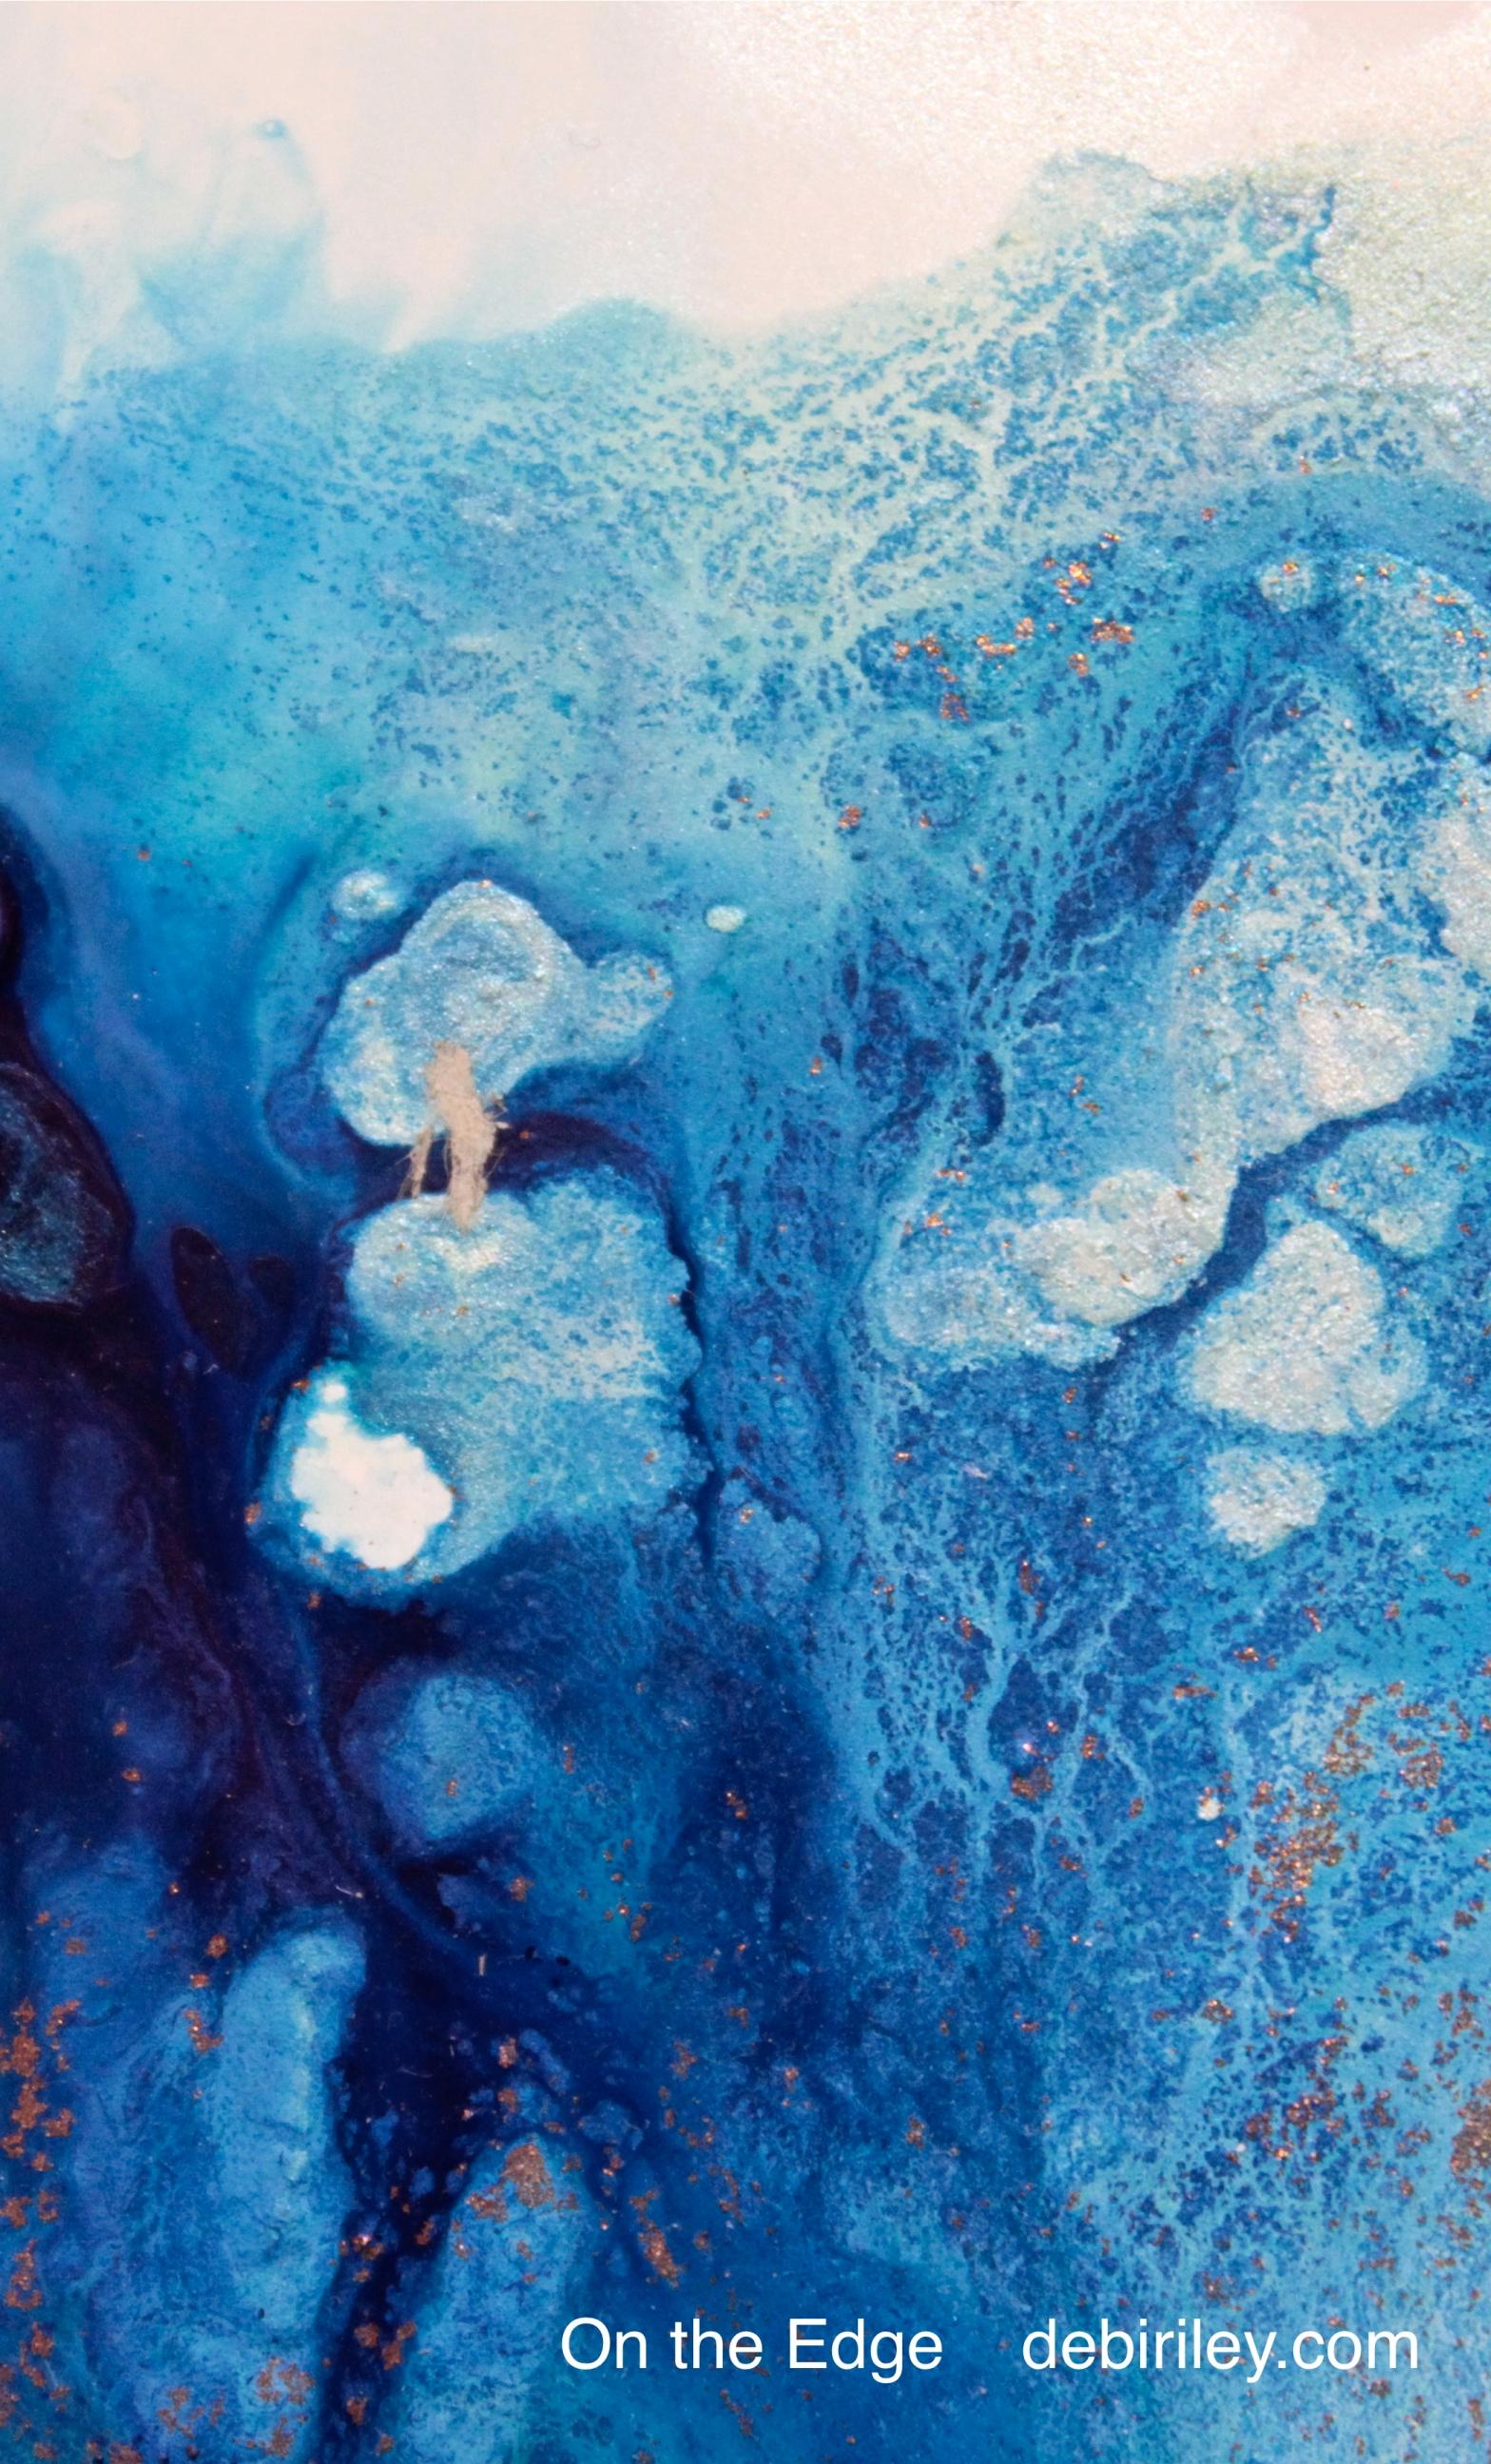 abstract painting in deep blues, ultramarine blue, prussian blue, easy art ideas for beginners, debiriley.com